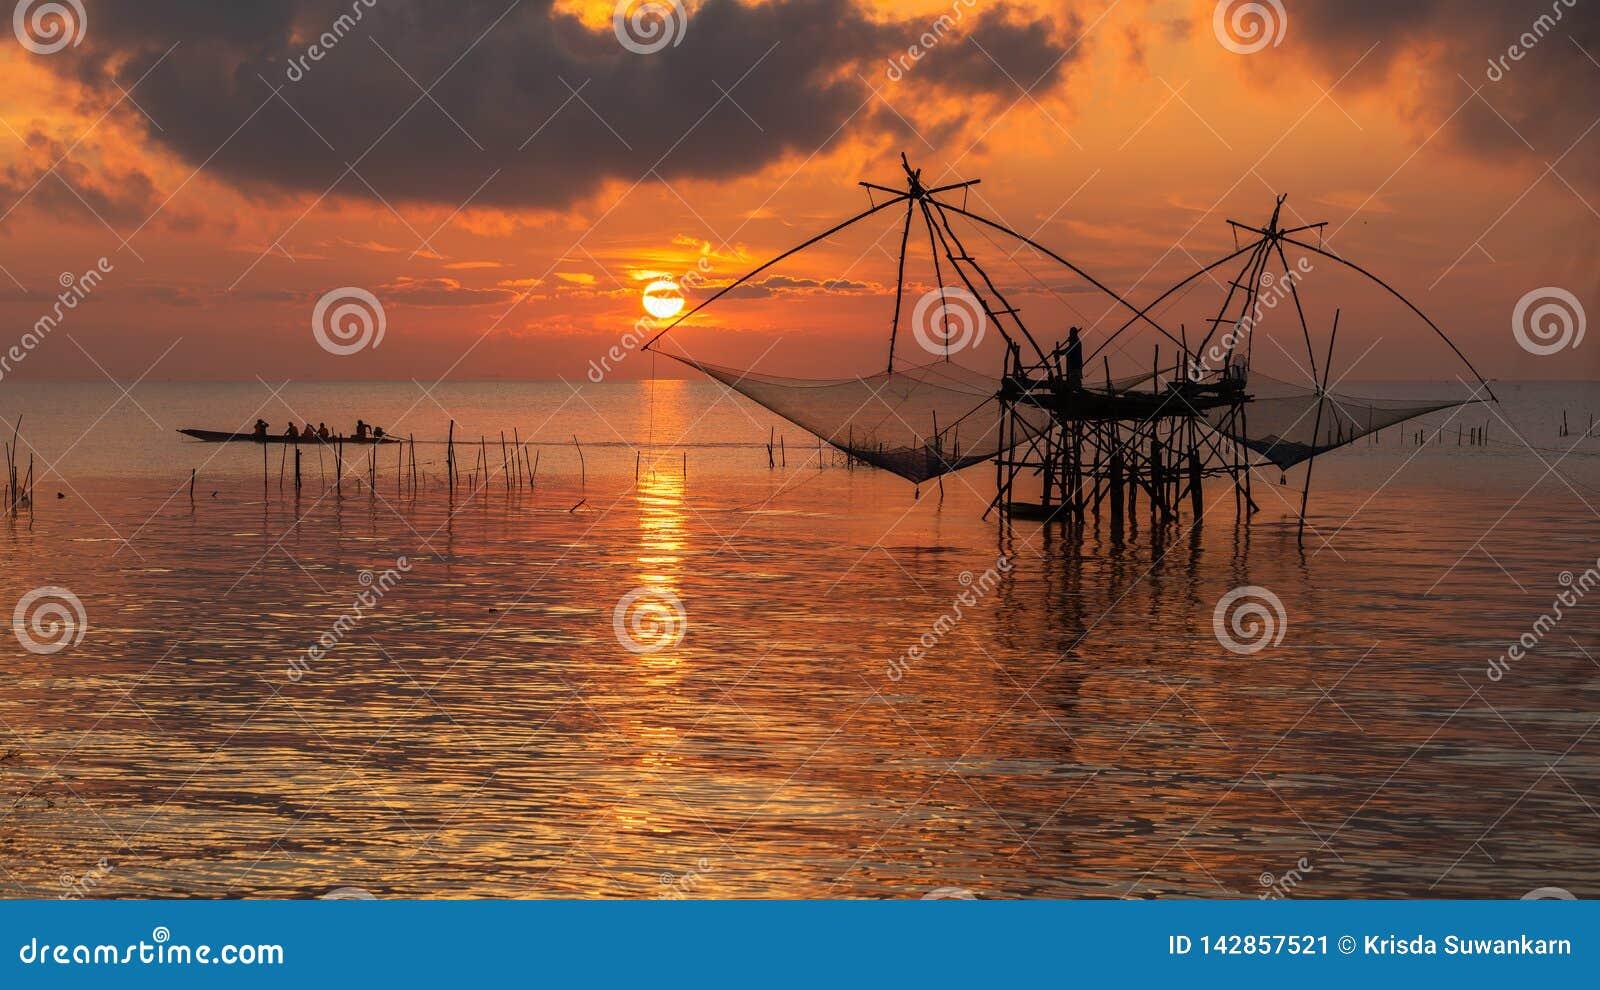 Zonsopganghemel met visser op vierkante onderdompeling netto en toerismeboot bij Pakpra-dorp